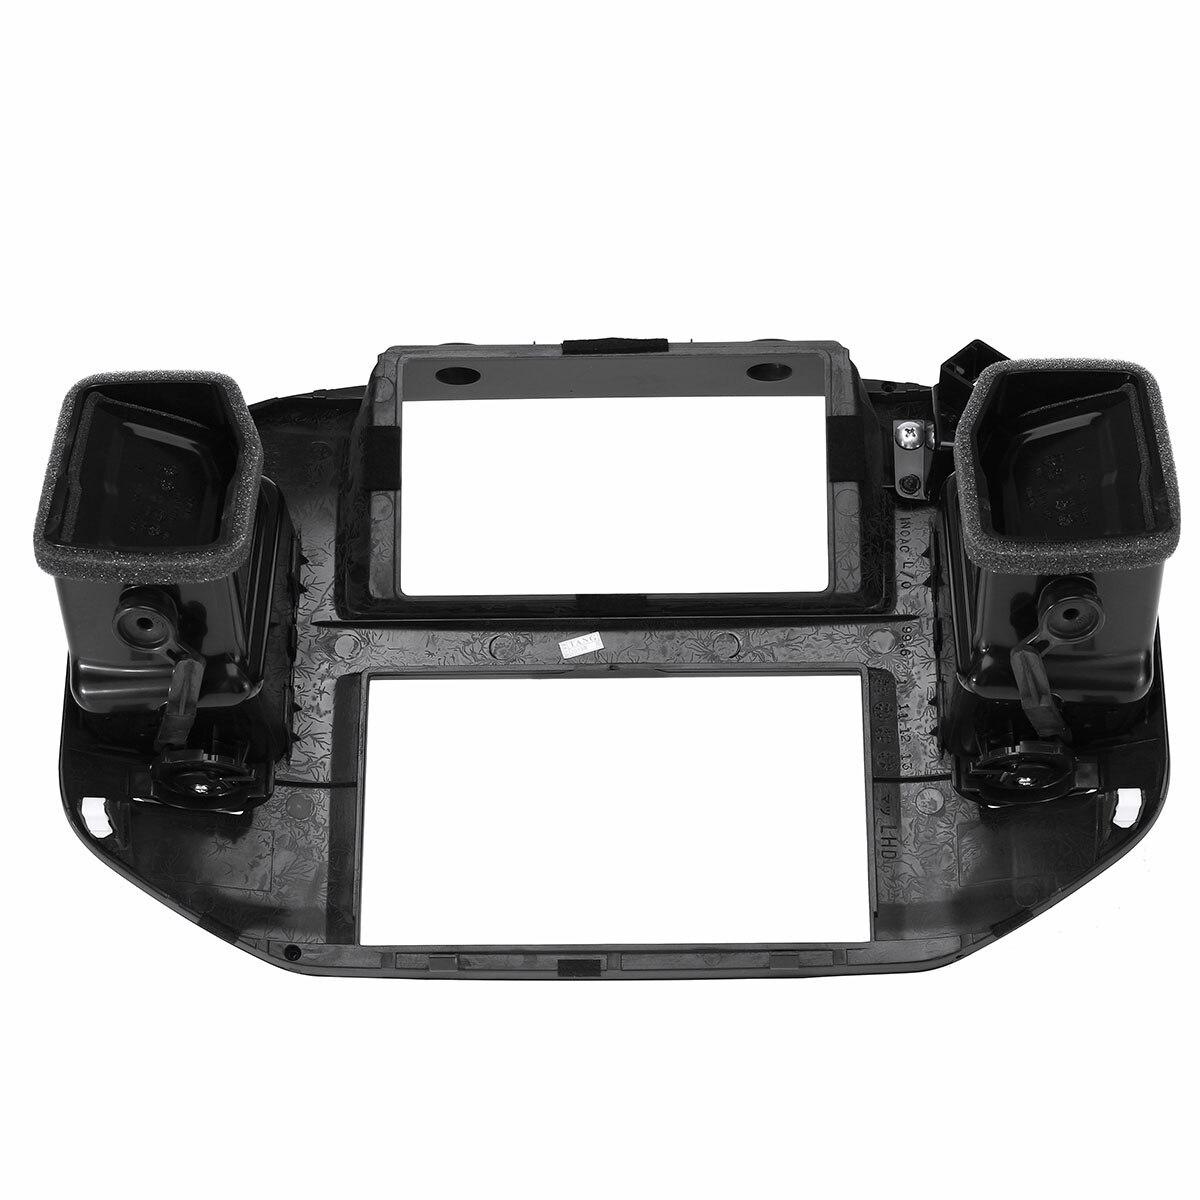 NIEUWE 1Pcs Black Front Dashboard Air Vent Outlet Panel Voor Mitsubishi Pajero Montero Shogun MK3 2001 2006 - 3